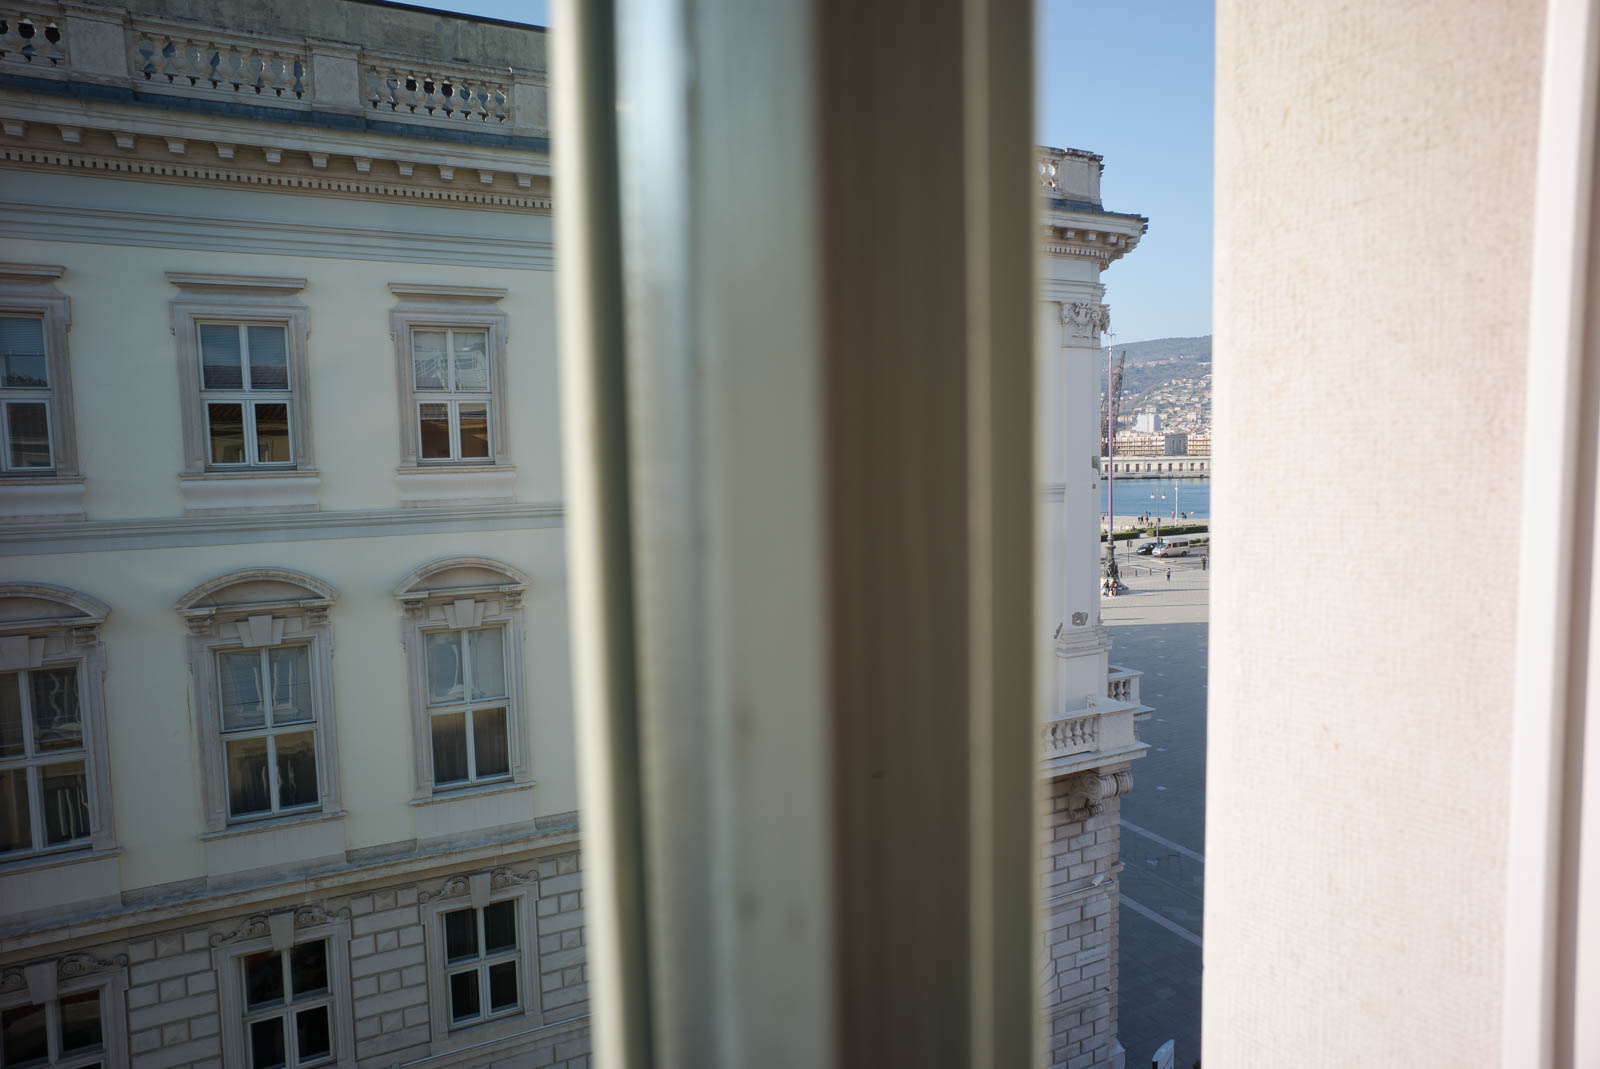 Room 406, Grand Hotel, Trieste, Italy